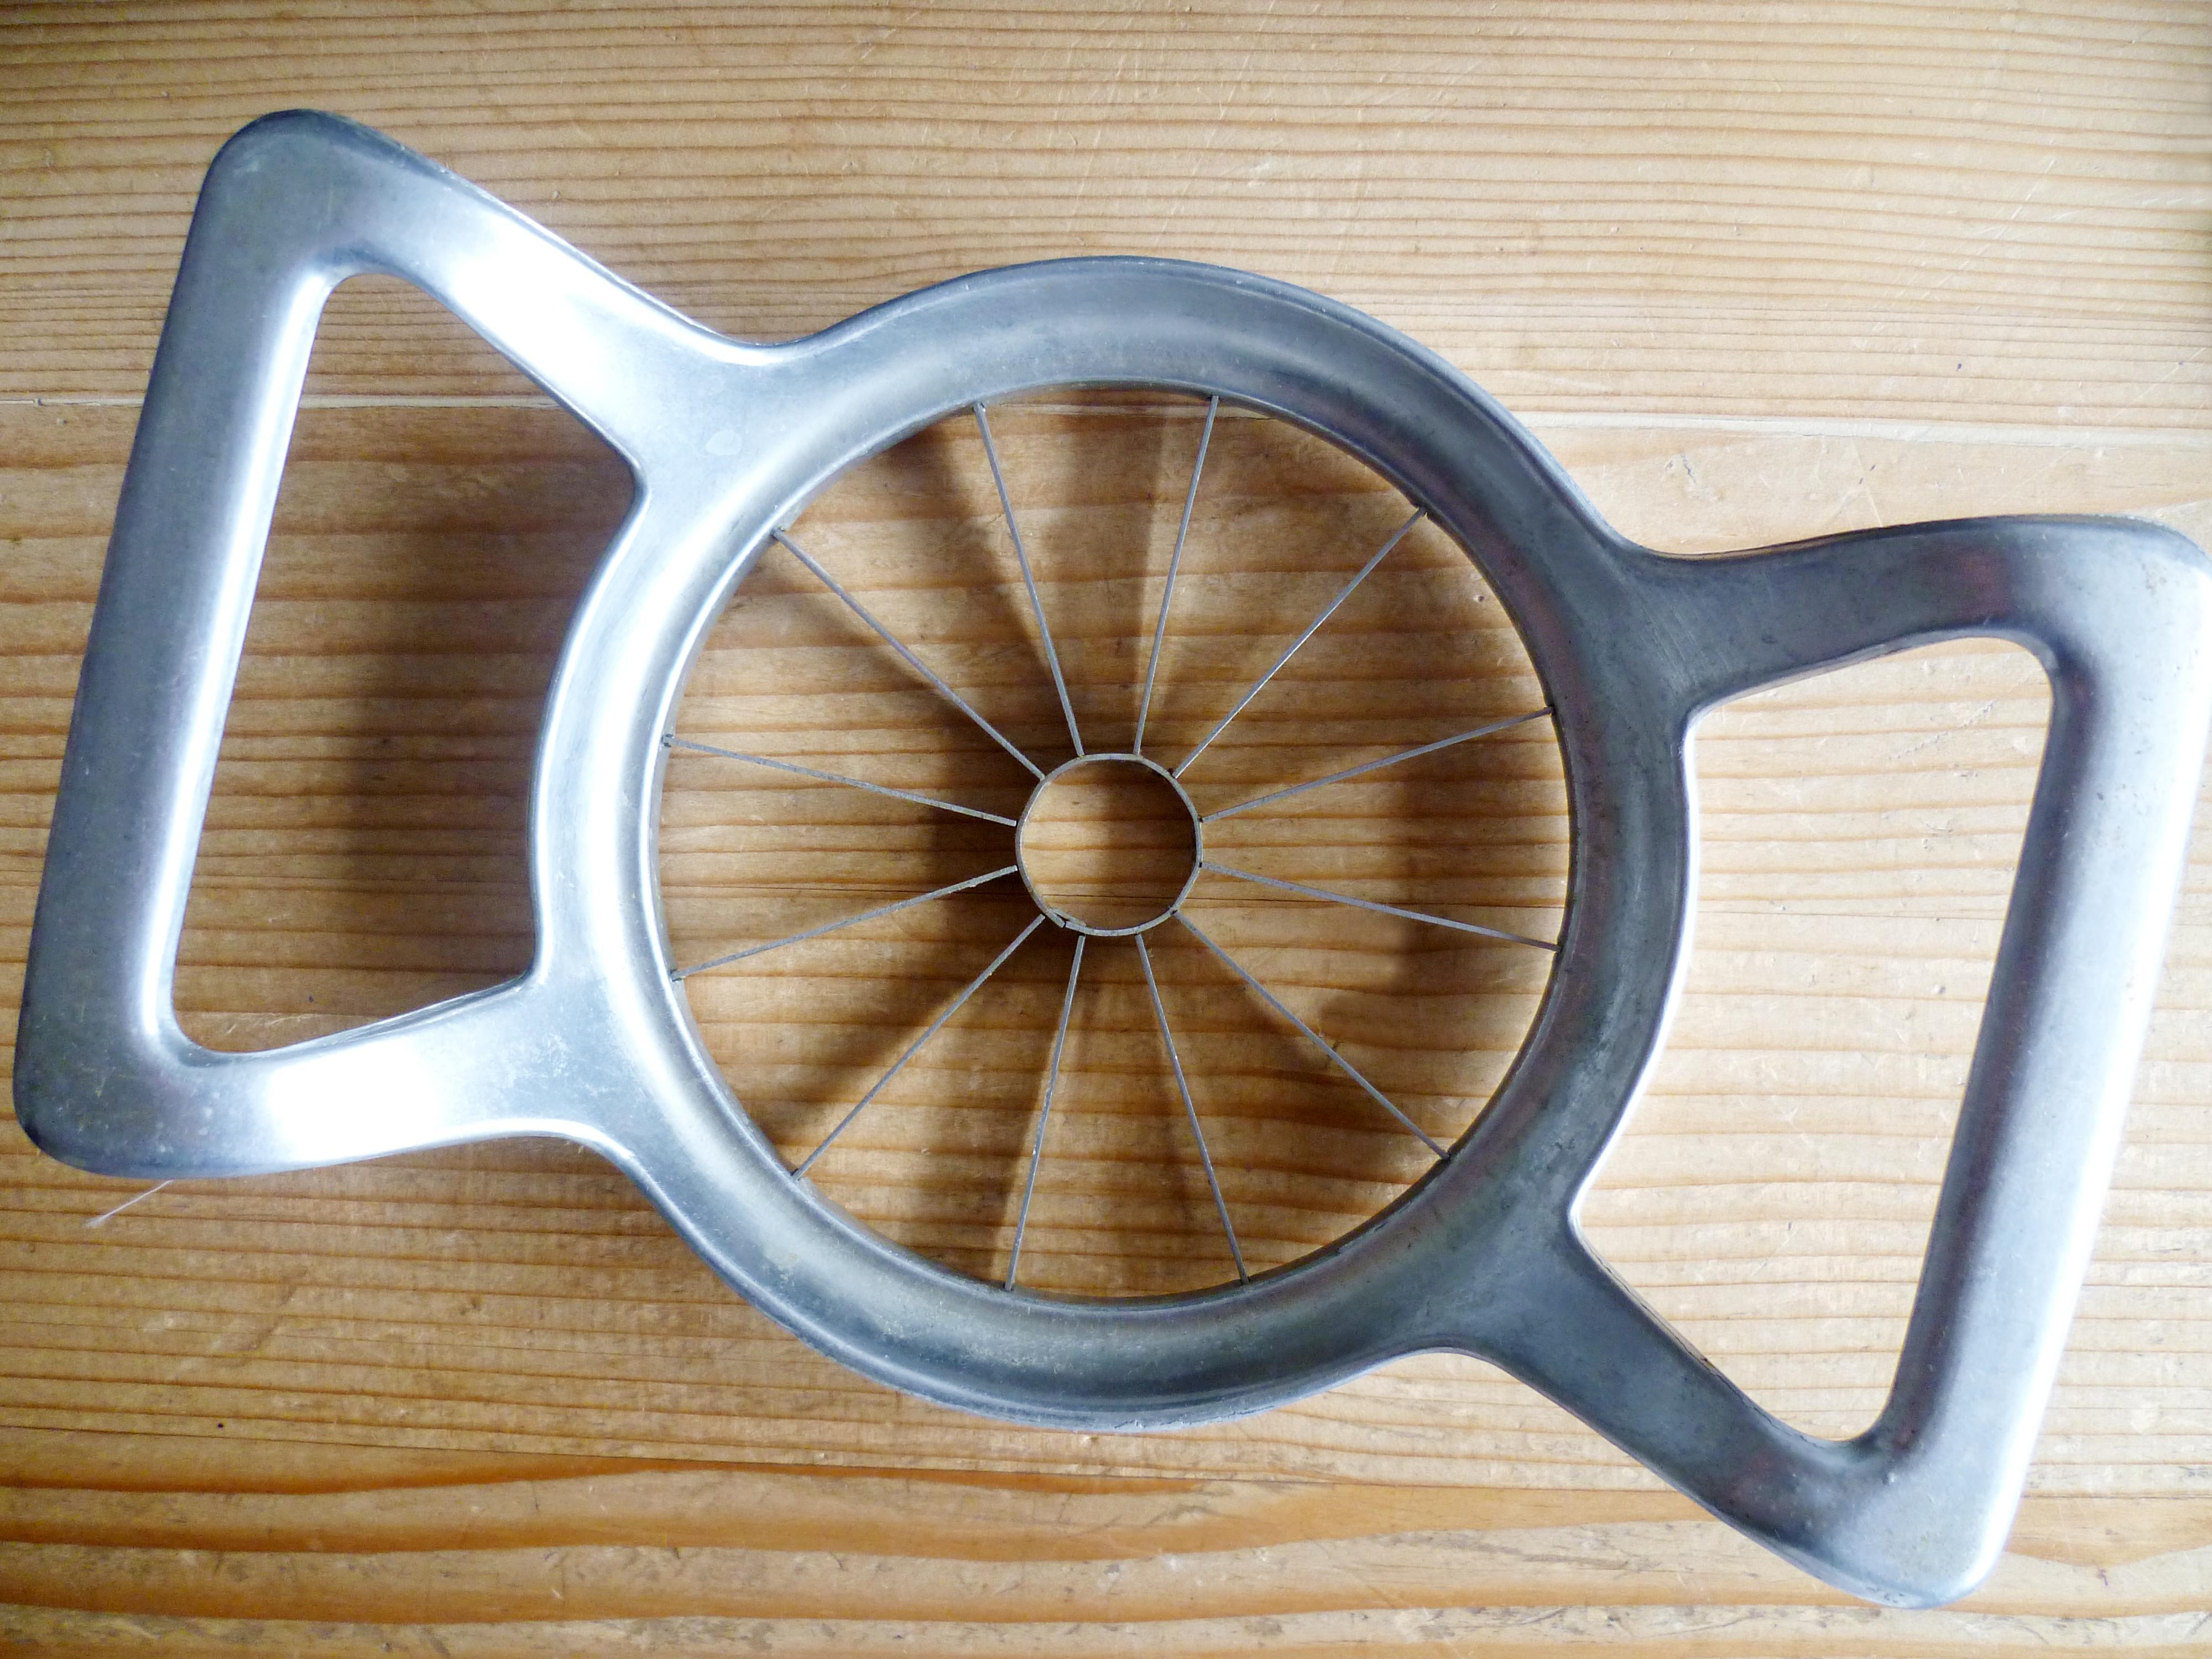 Apple slicer on wooden table